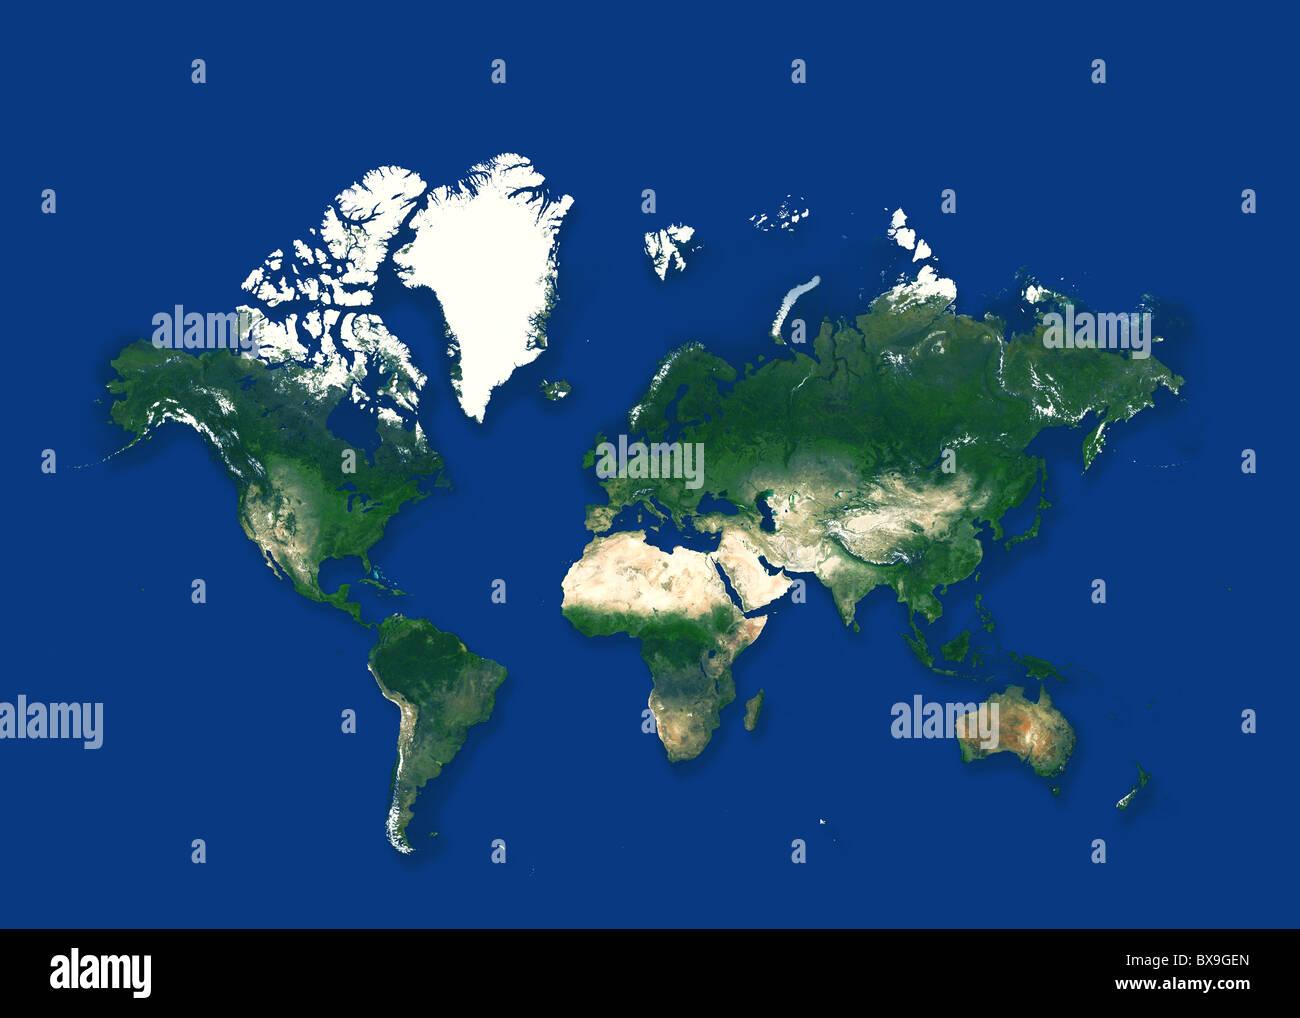 Carte du monde en arrière-plan bleu Photo Stock